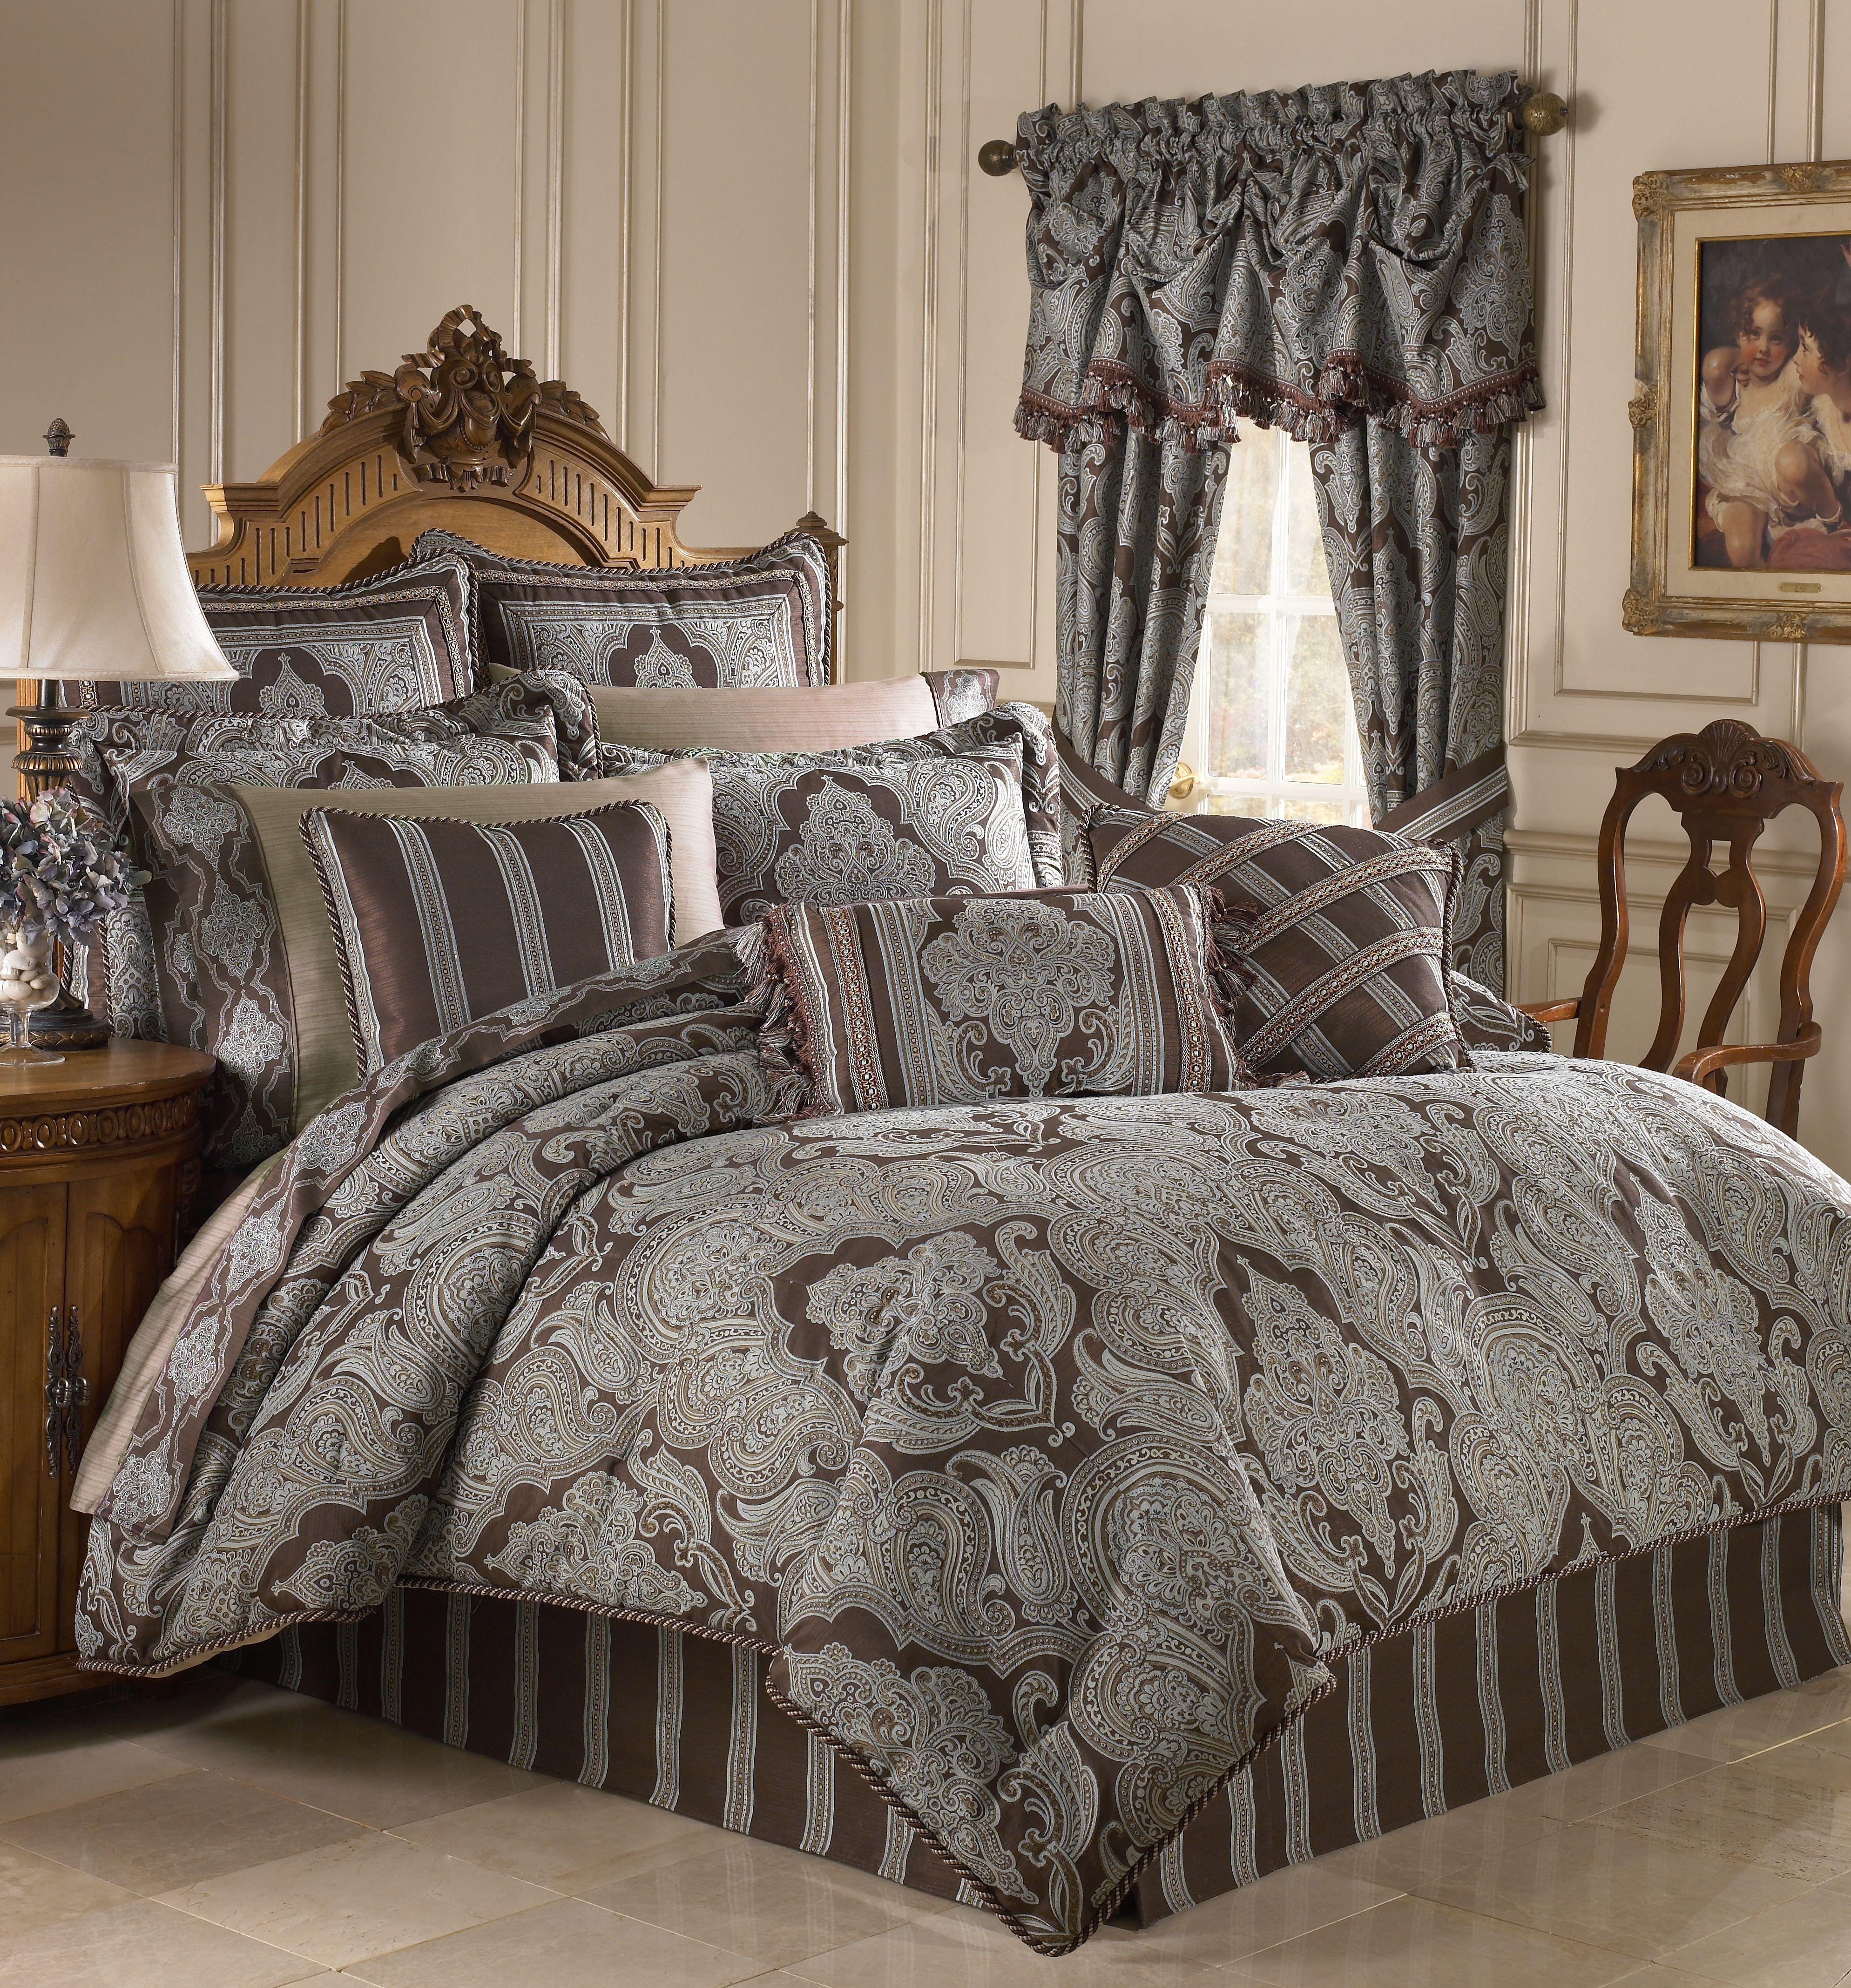 Croscill Royalton Bedding Aj Moss Comforter Sets Bedding And Curtain Sets Croscill Bedding King comforter sets with curtains